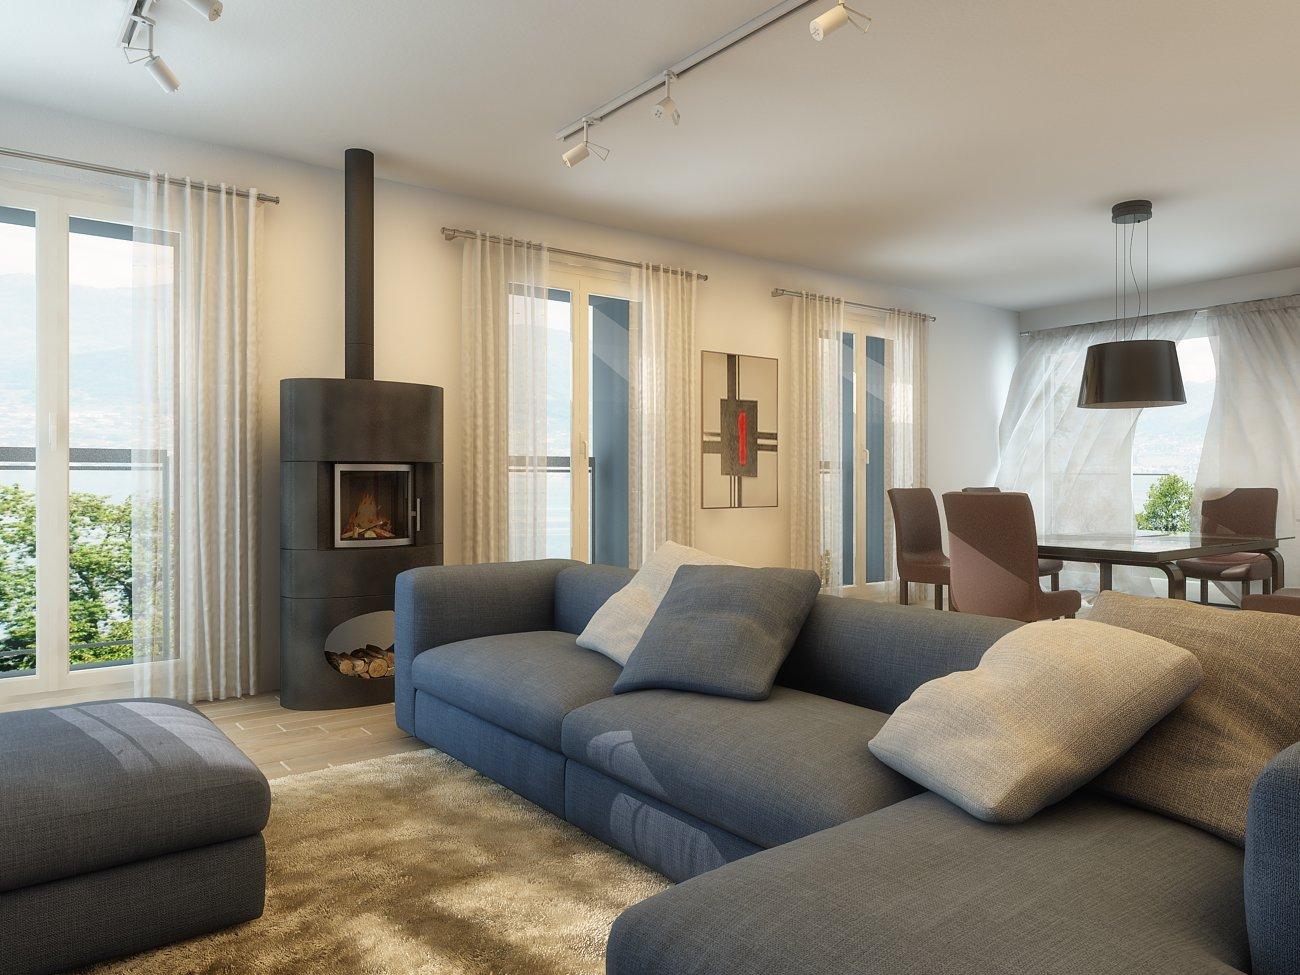 Bergamo rendering 3d fotorealistici interni ed esterni for Rendering 3d interni